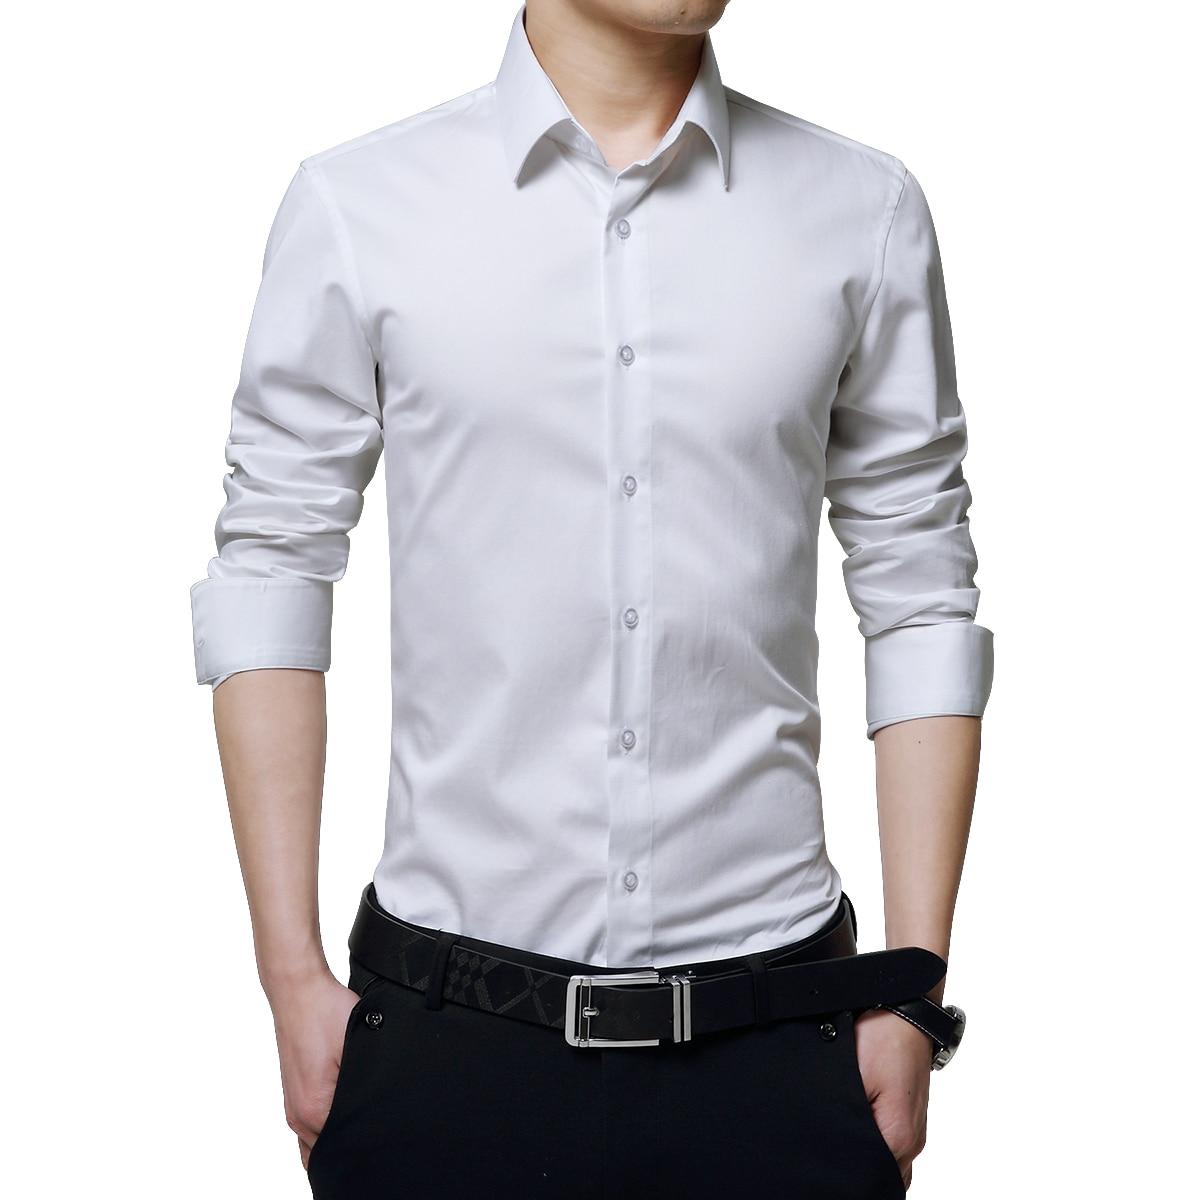 Aliexpress Buy Browon Brand Men Dress Shirts Mercerized Cotton